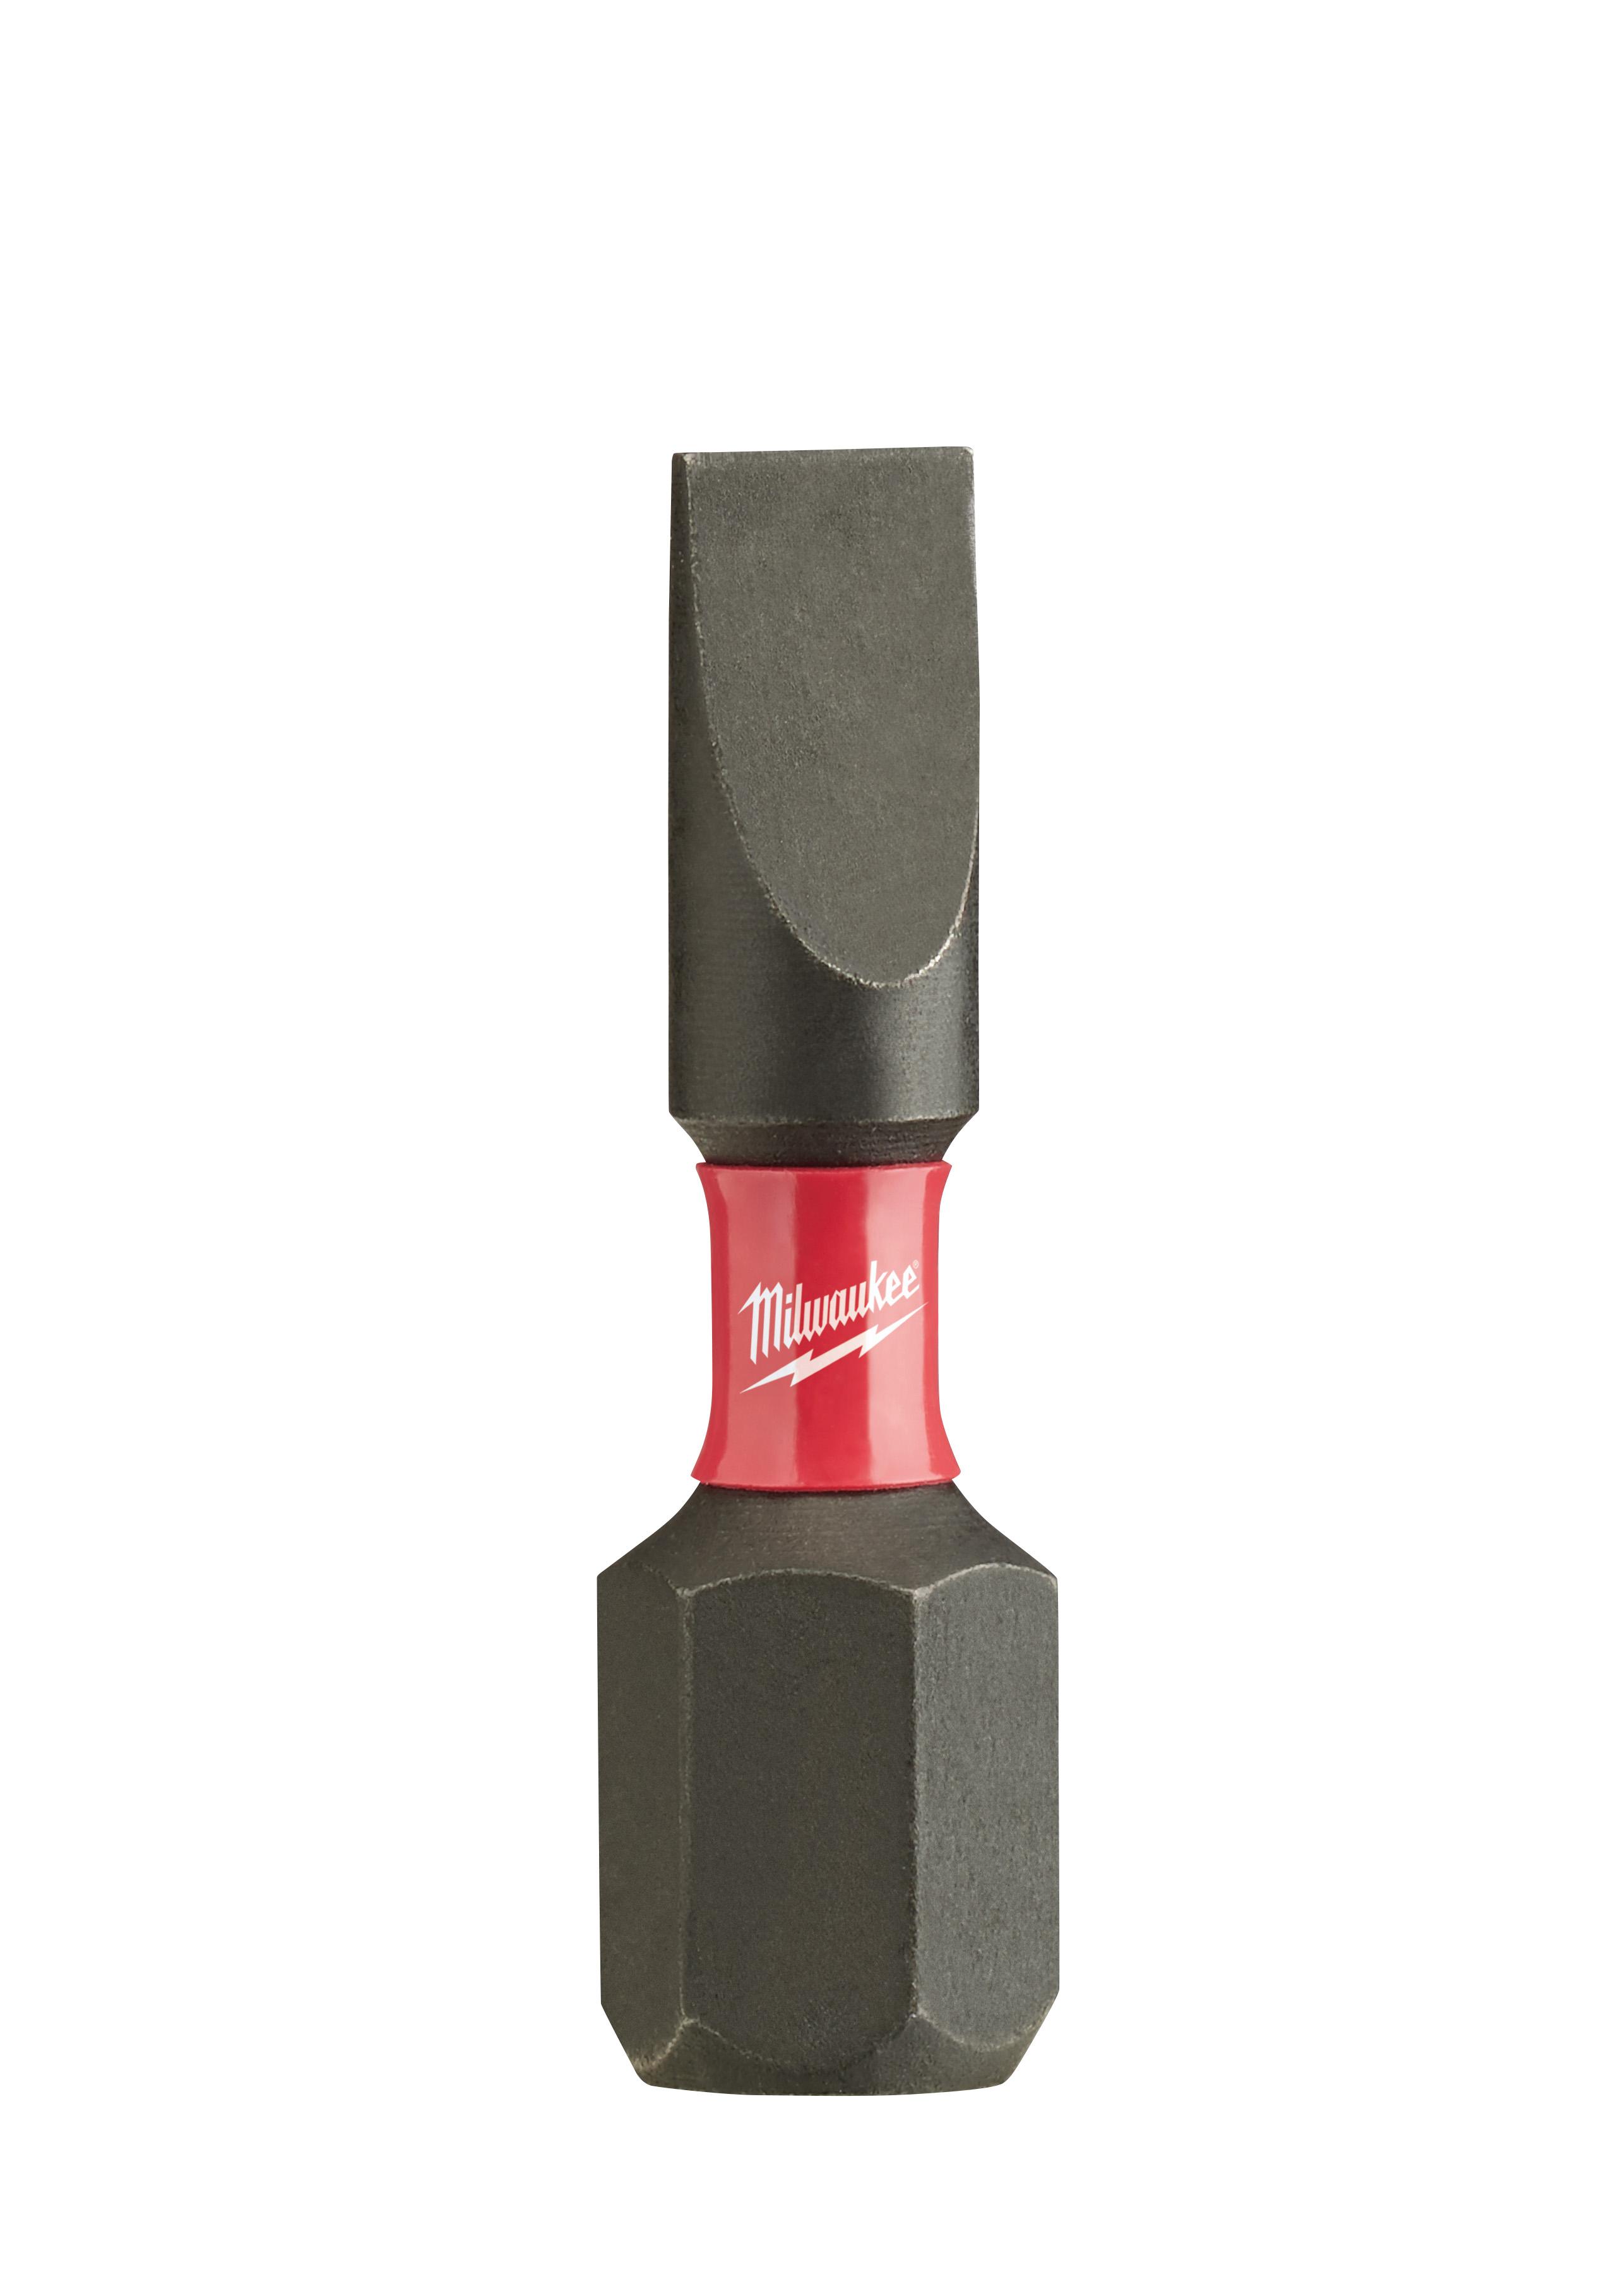 Milwaukee® SHOCKWAVE™ 48-32-4717 Impact Insert Bit, 3/16 in Slotted Point, 1 in OAL, Custom Alloy76™ Steel